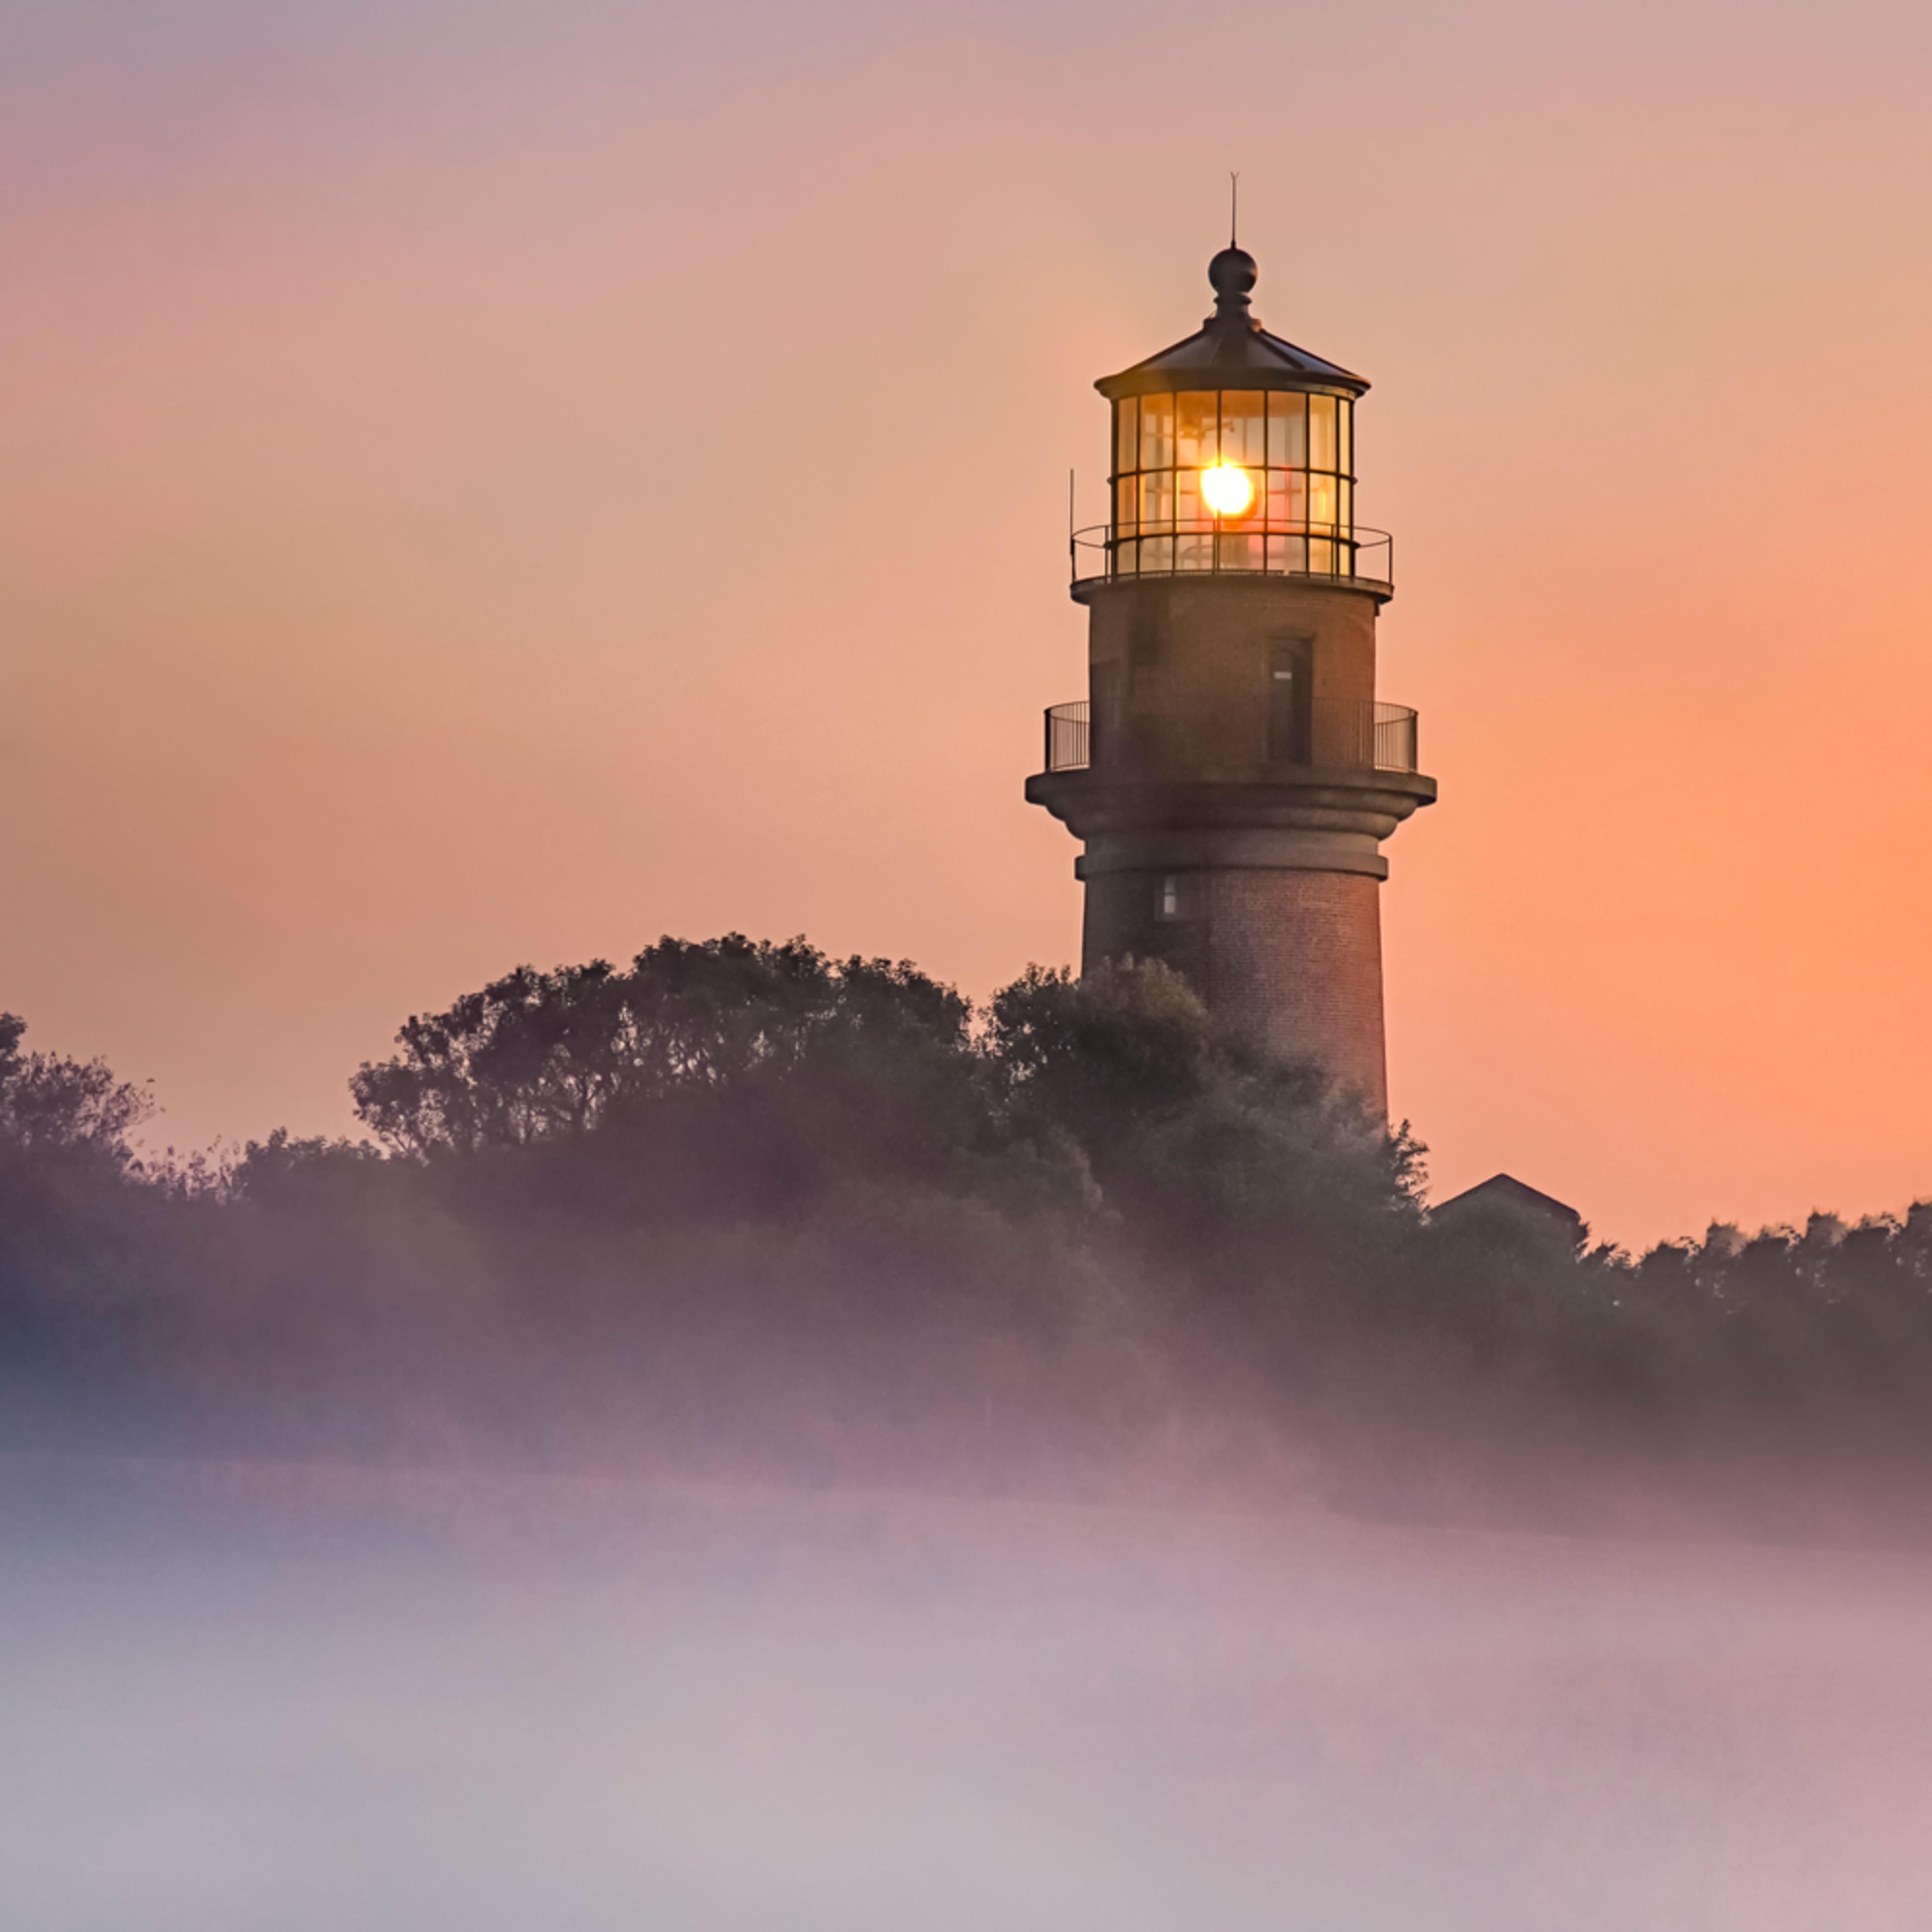 Gay head light fog sunrise iuw1fp